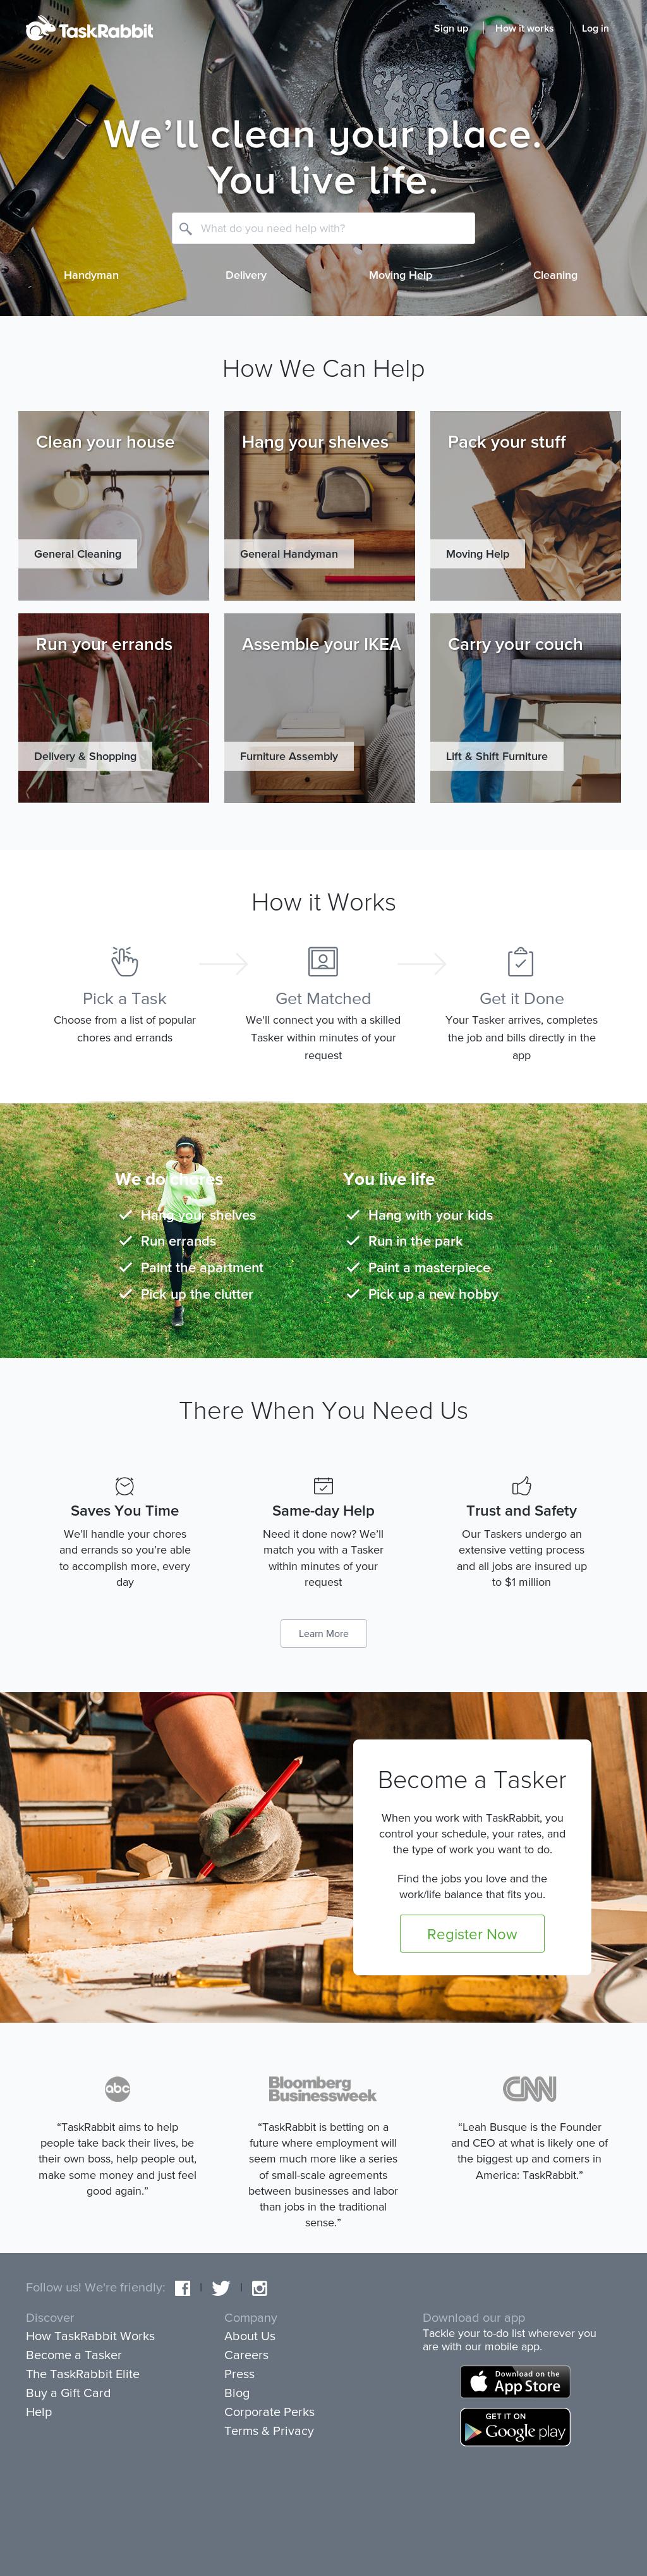 TaskRabbit Competitors, Revenue and Employees - Owler